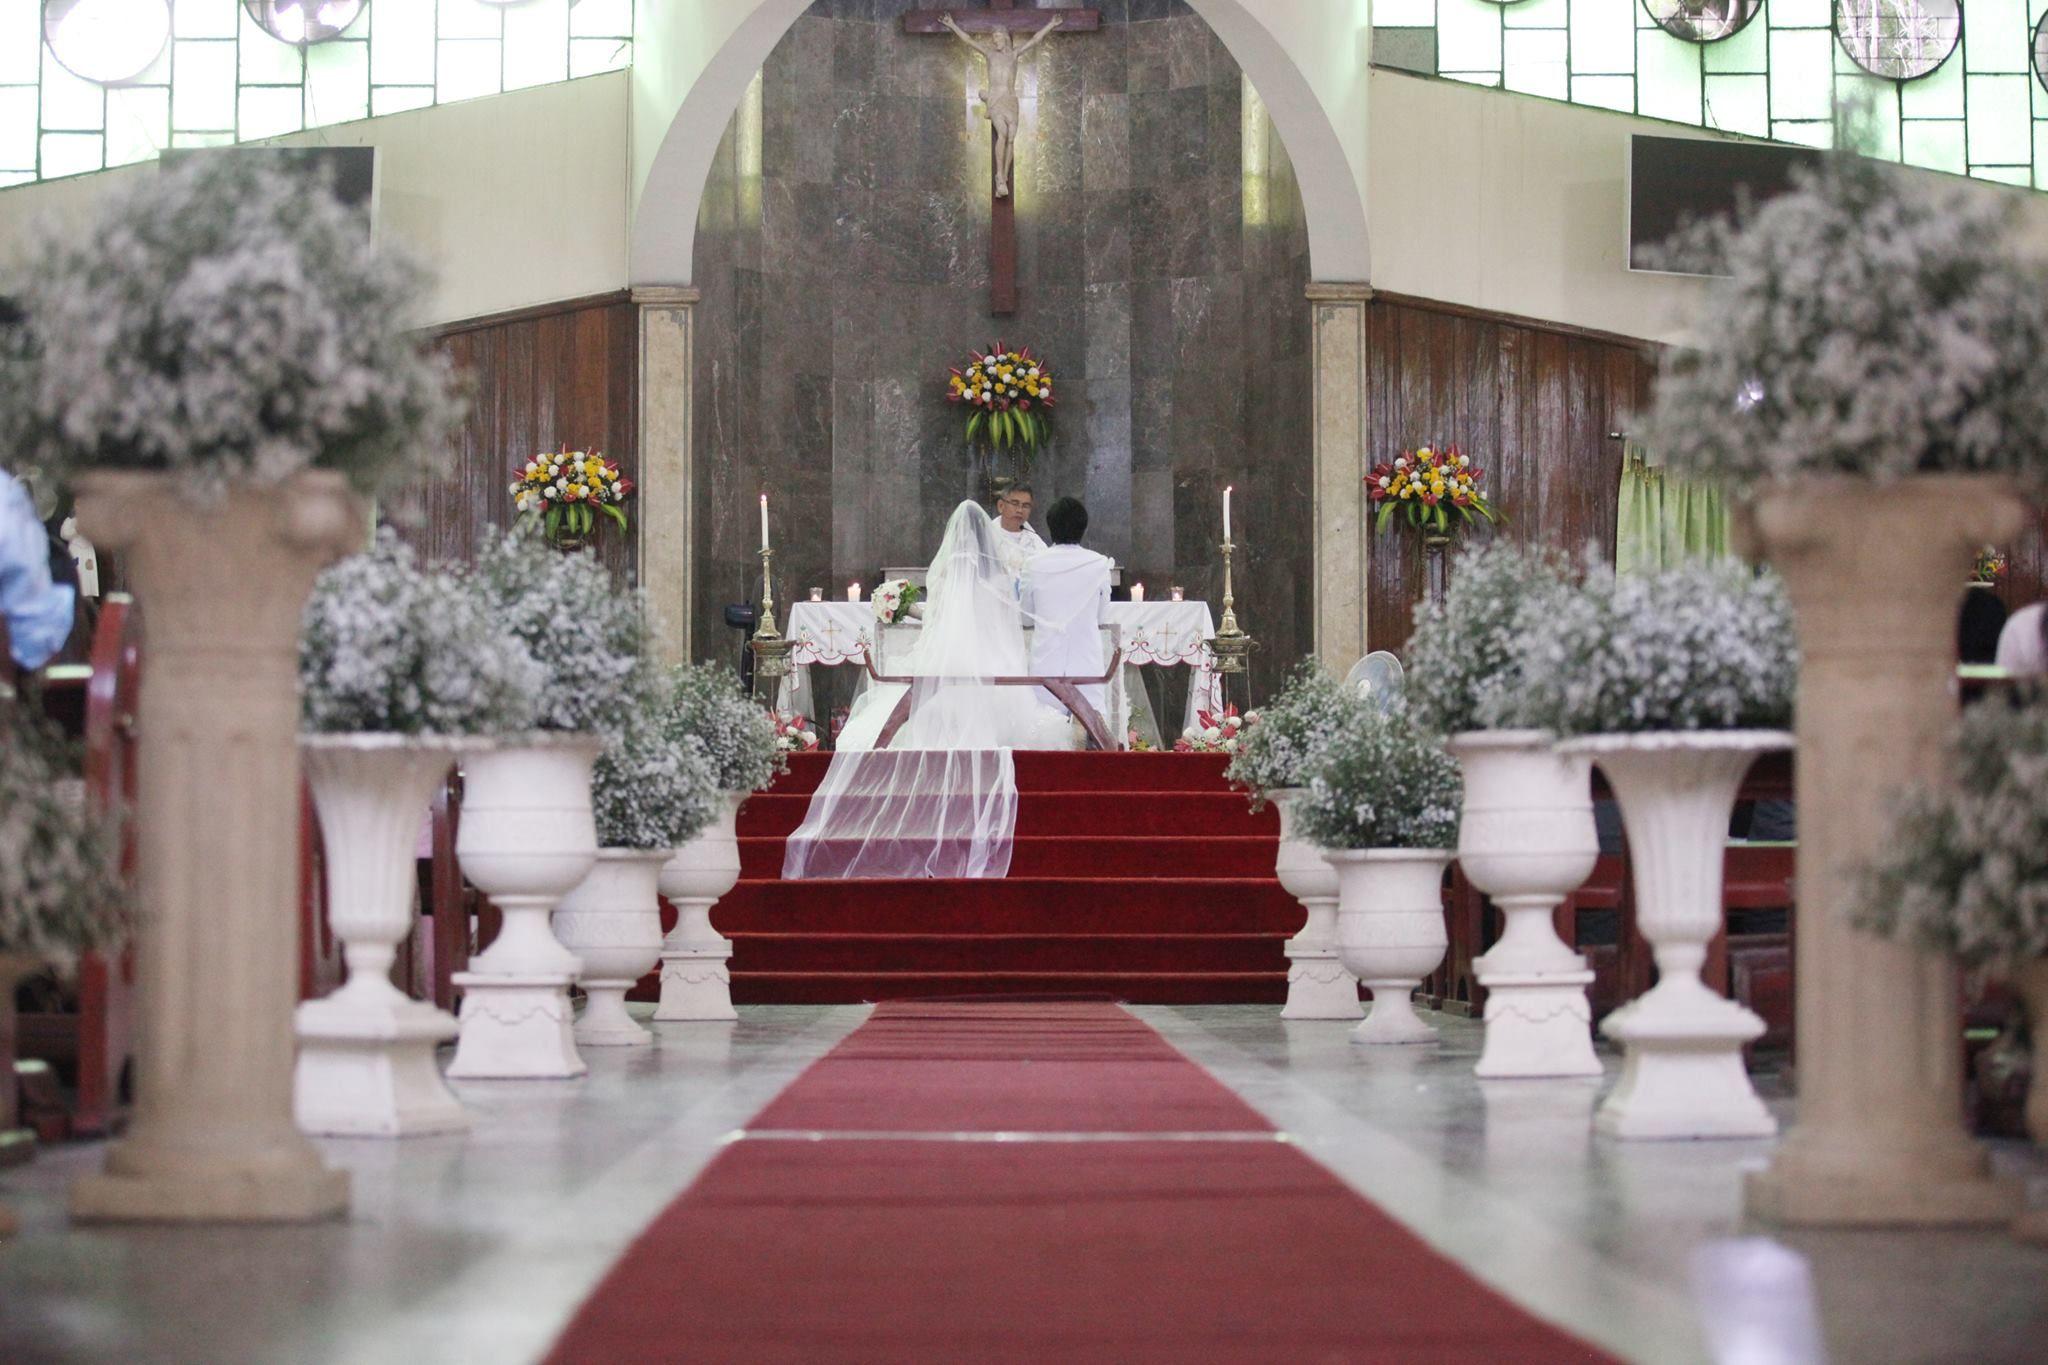 catholic church aisle decorations with baby's breath